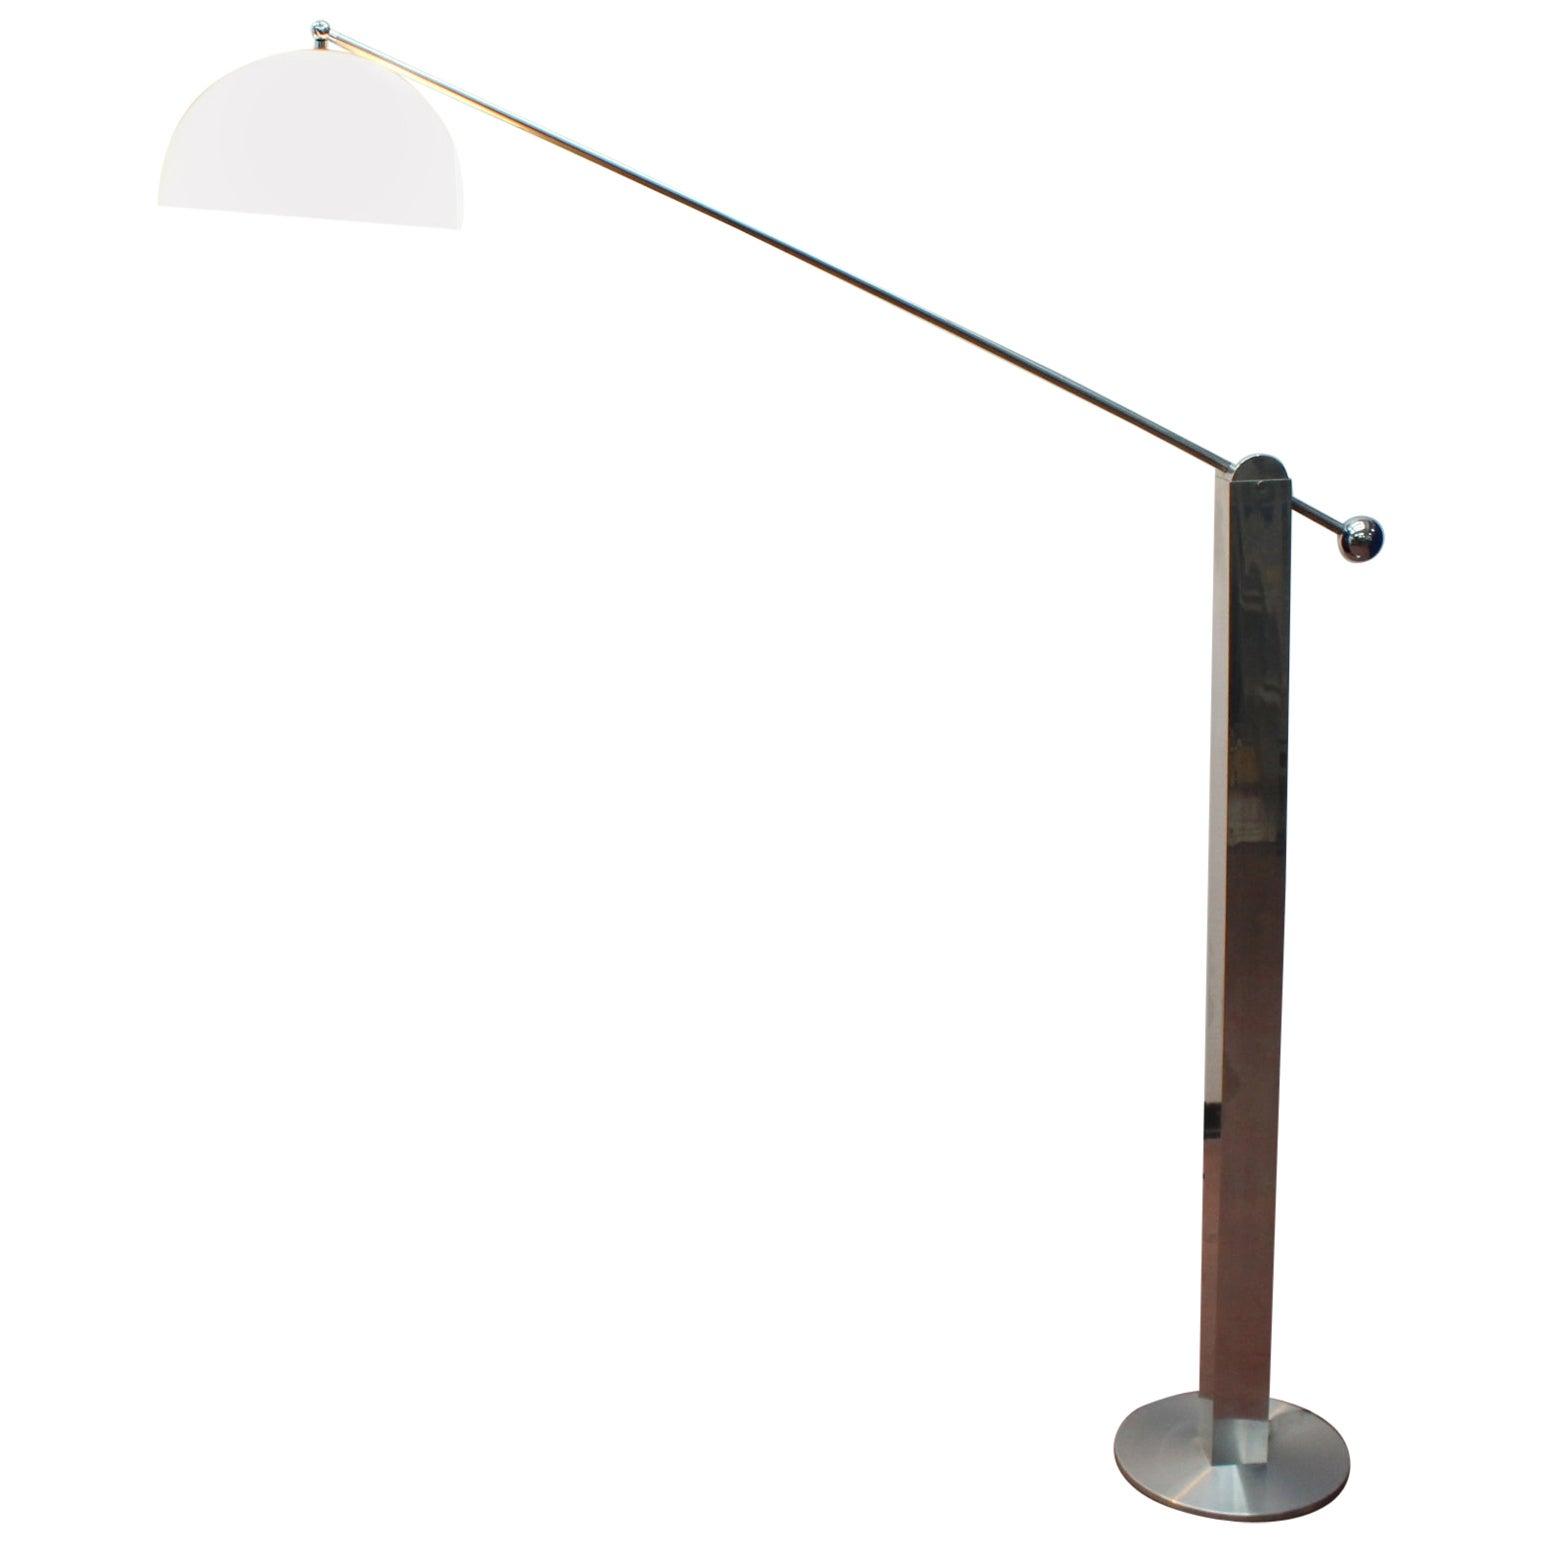 Midcentury Chromed Floor Lamp Reggiani Italy 1970s